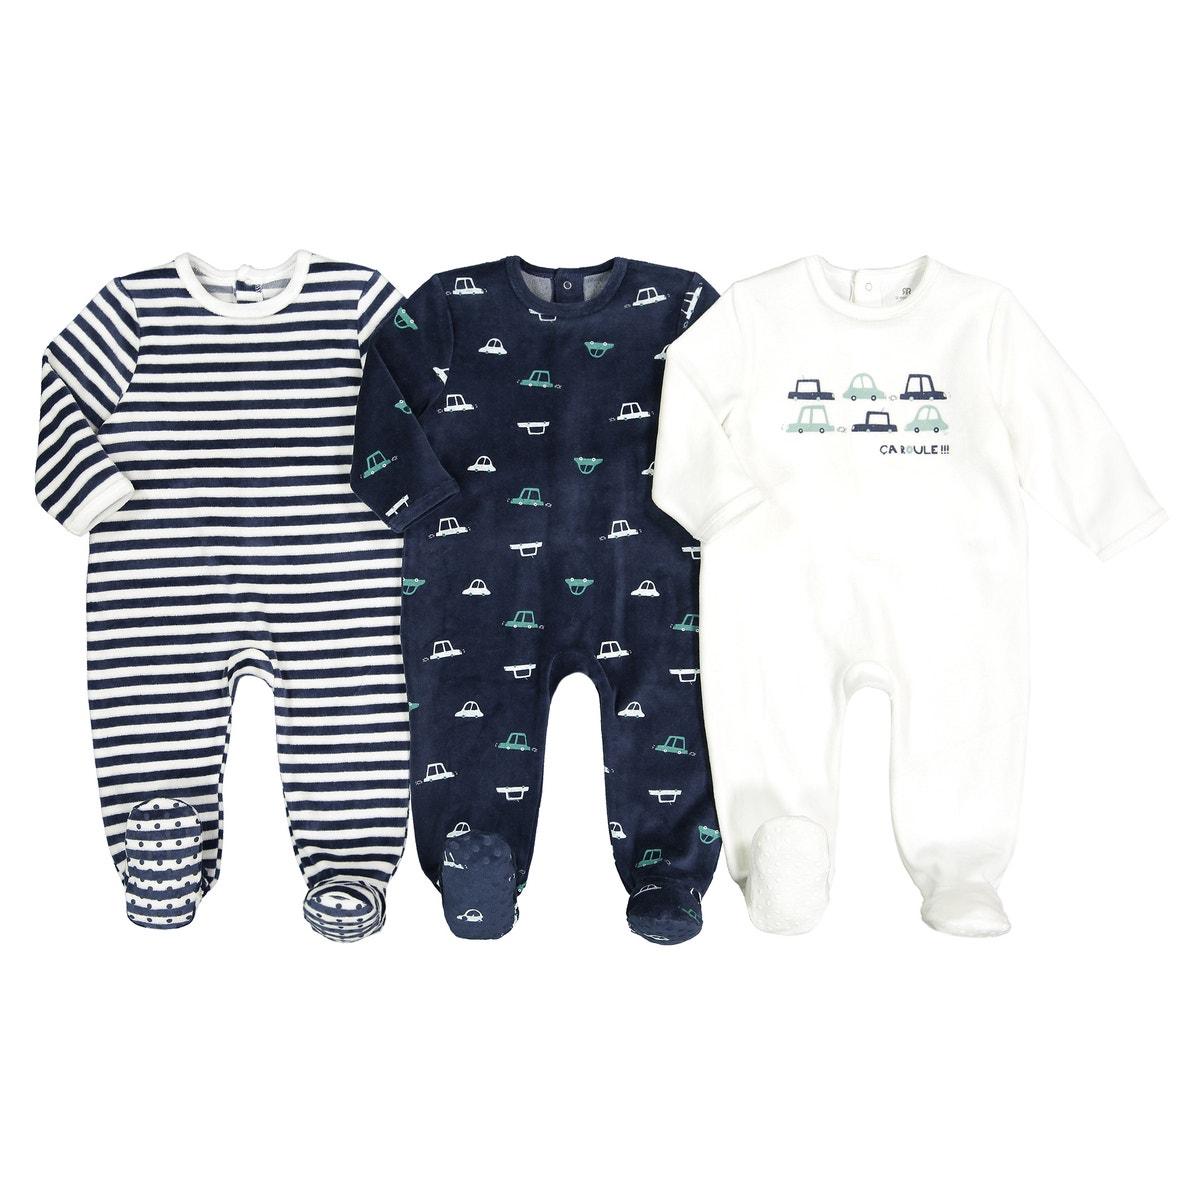 La Redoute: Τα πιο όμορφα και άνετα ρούχα για την μέλλουσα μαμά και το μωρό